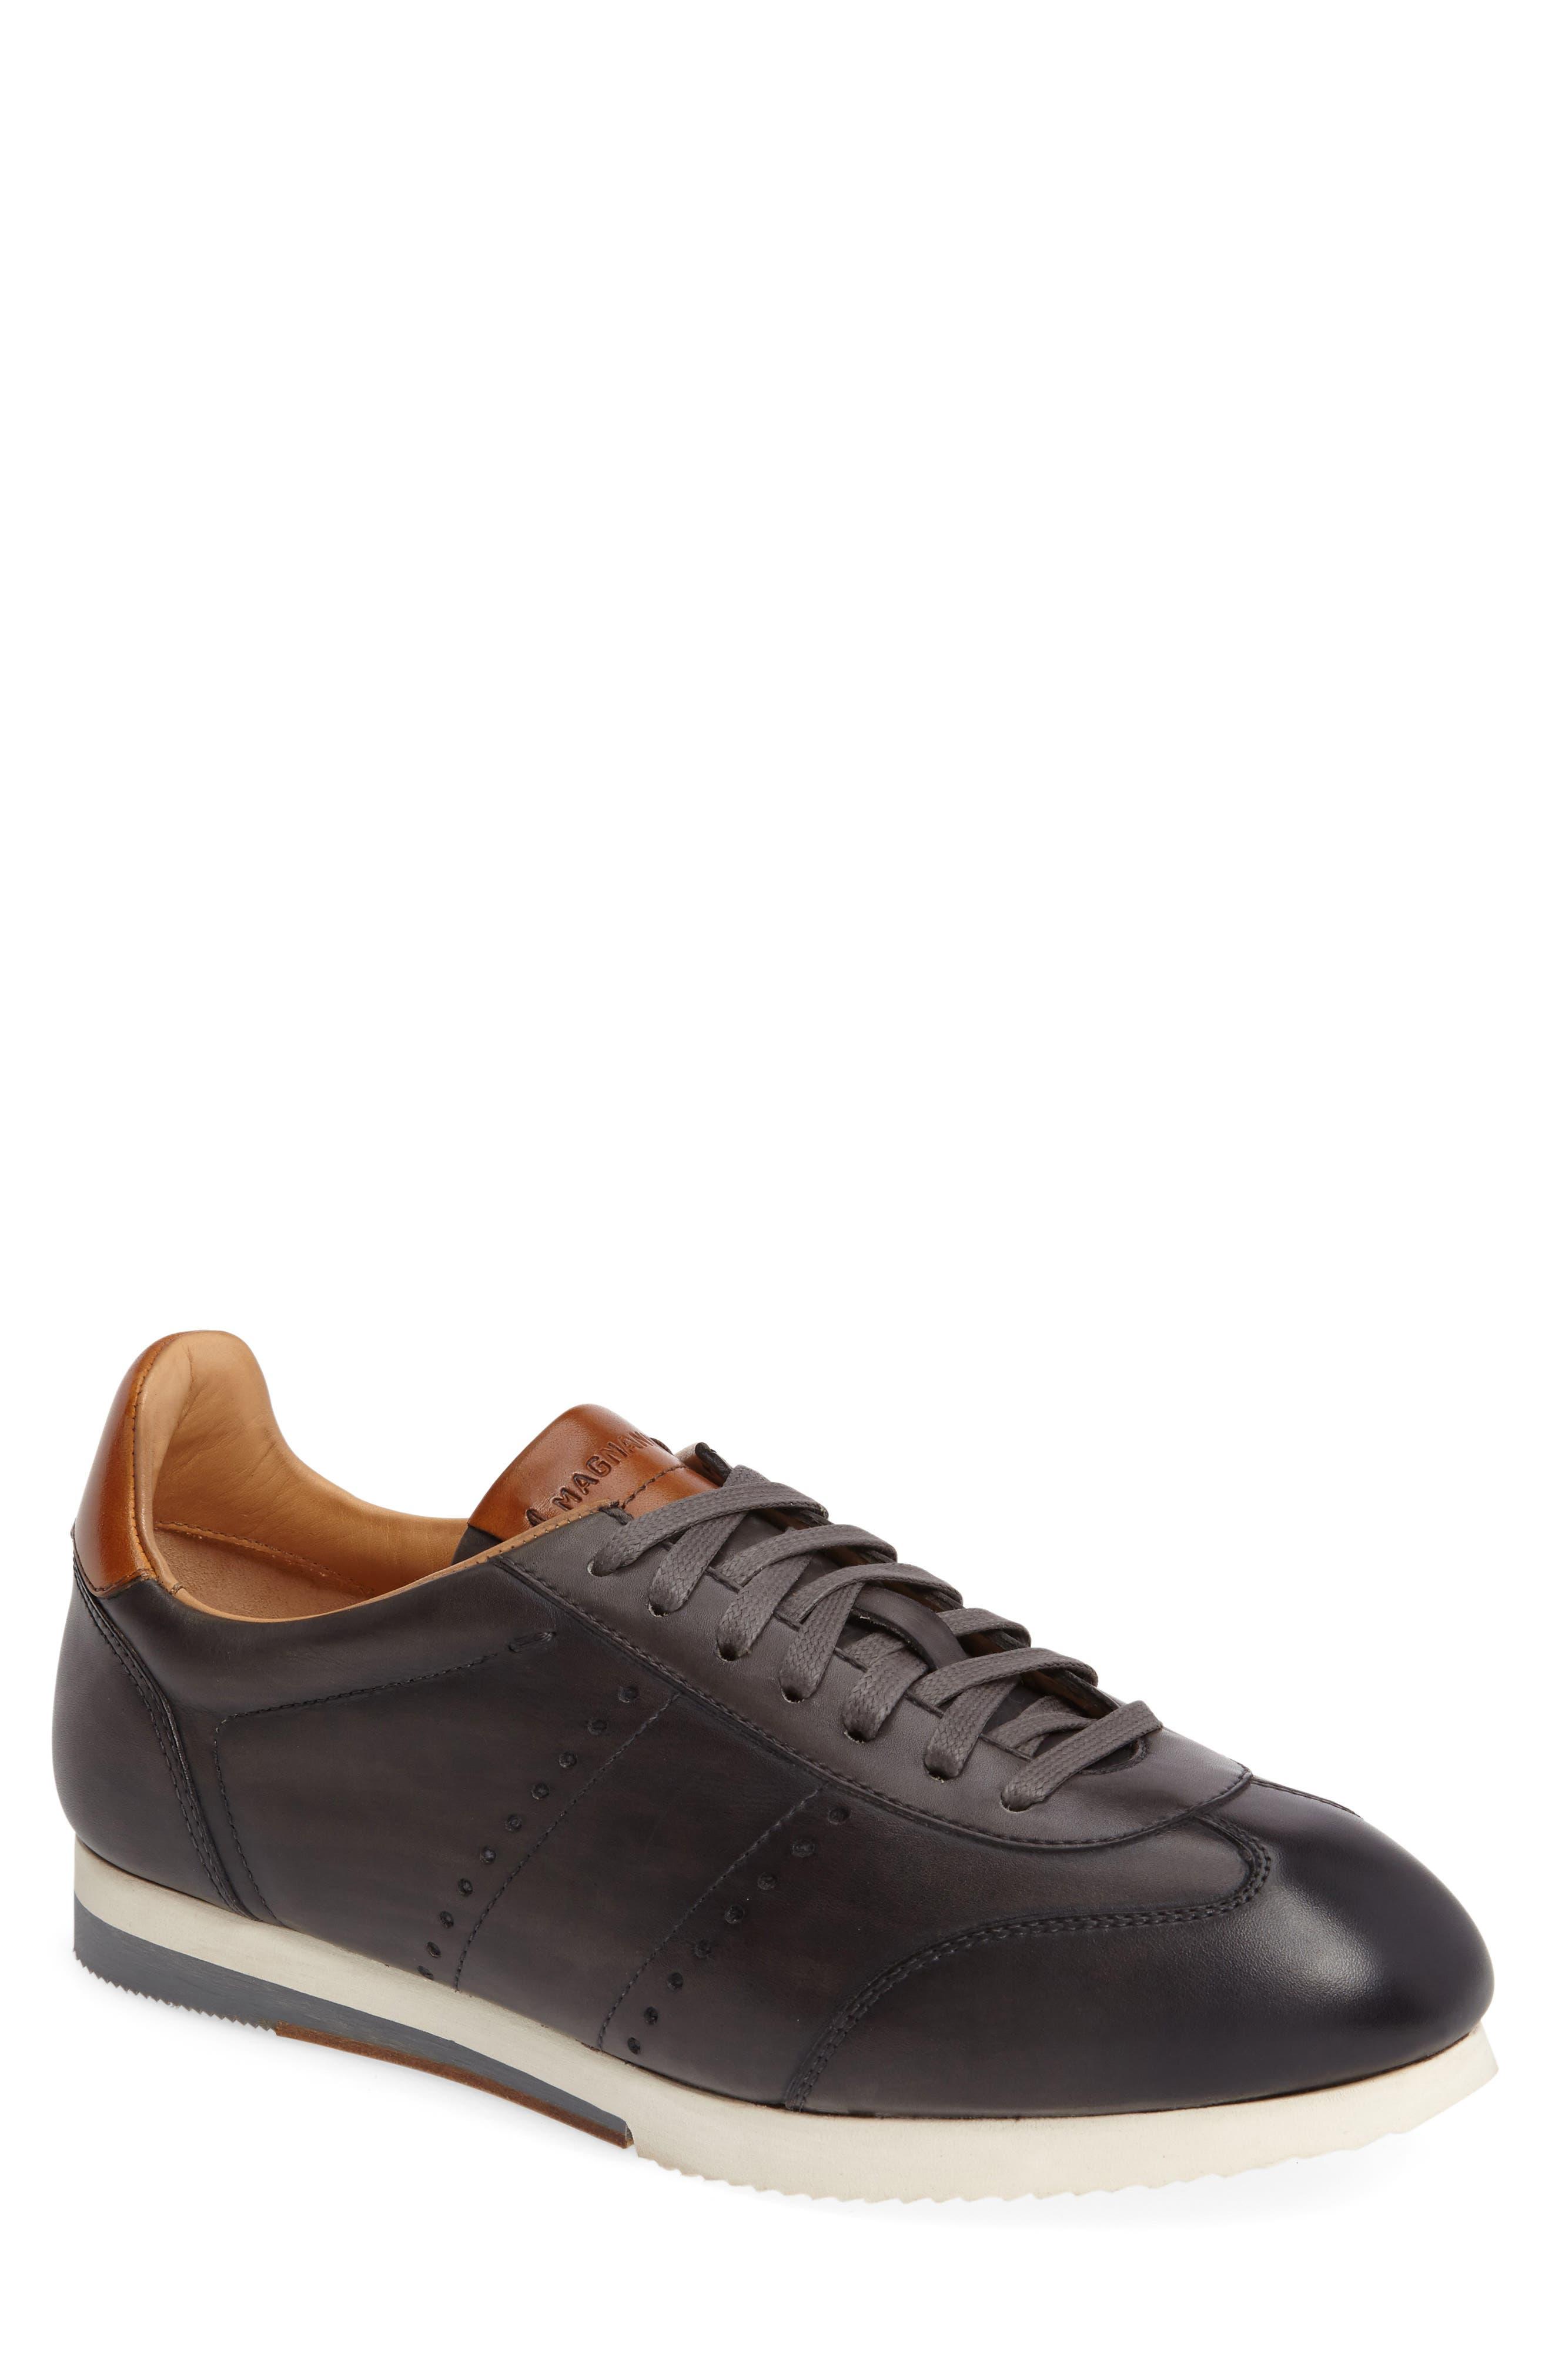 Alternate Image 1 Selected - Magnanni Isco Sneaker (Men)